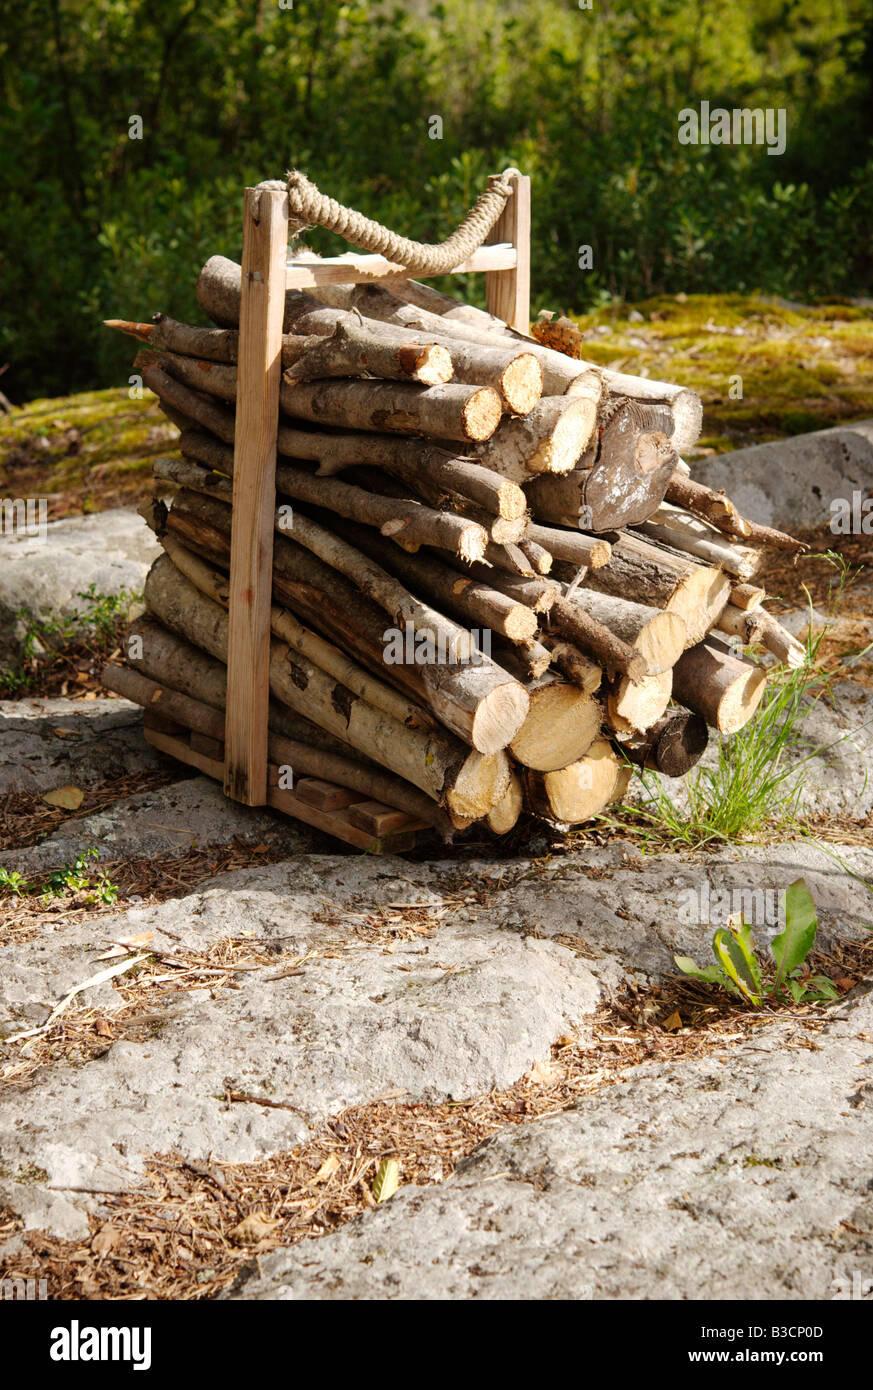 Firewood for sauna at a Finnish summerhouse, Kangasniemi, Finland - Stock Image